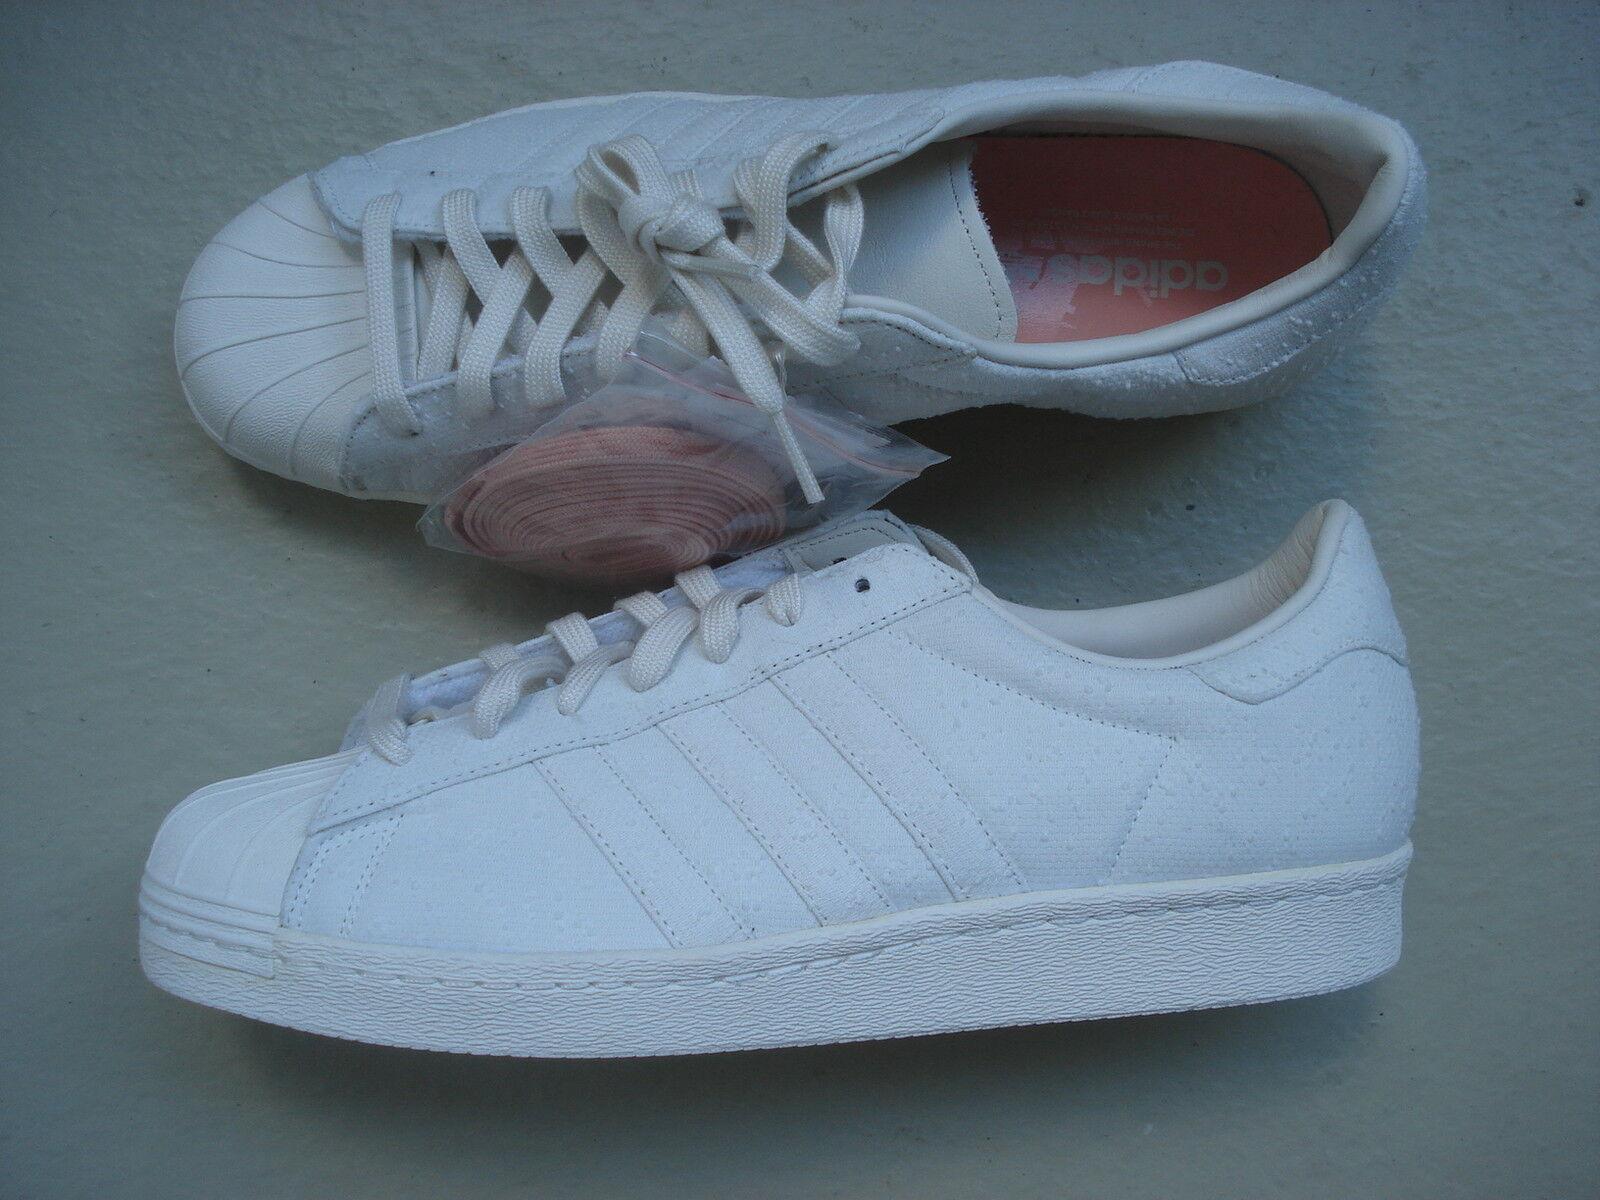 zapatillasnstuff x adidas Superstar 80s 45 1 3  Shades of blanco  Pack WHT duspnk